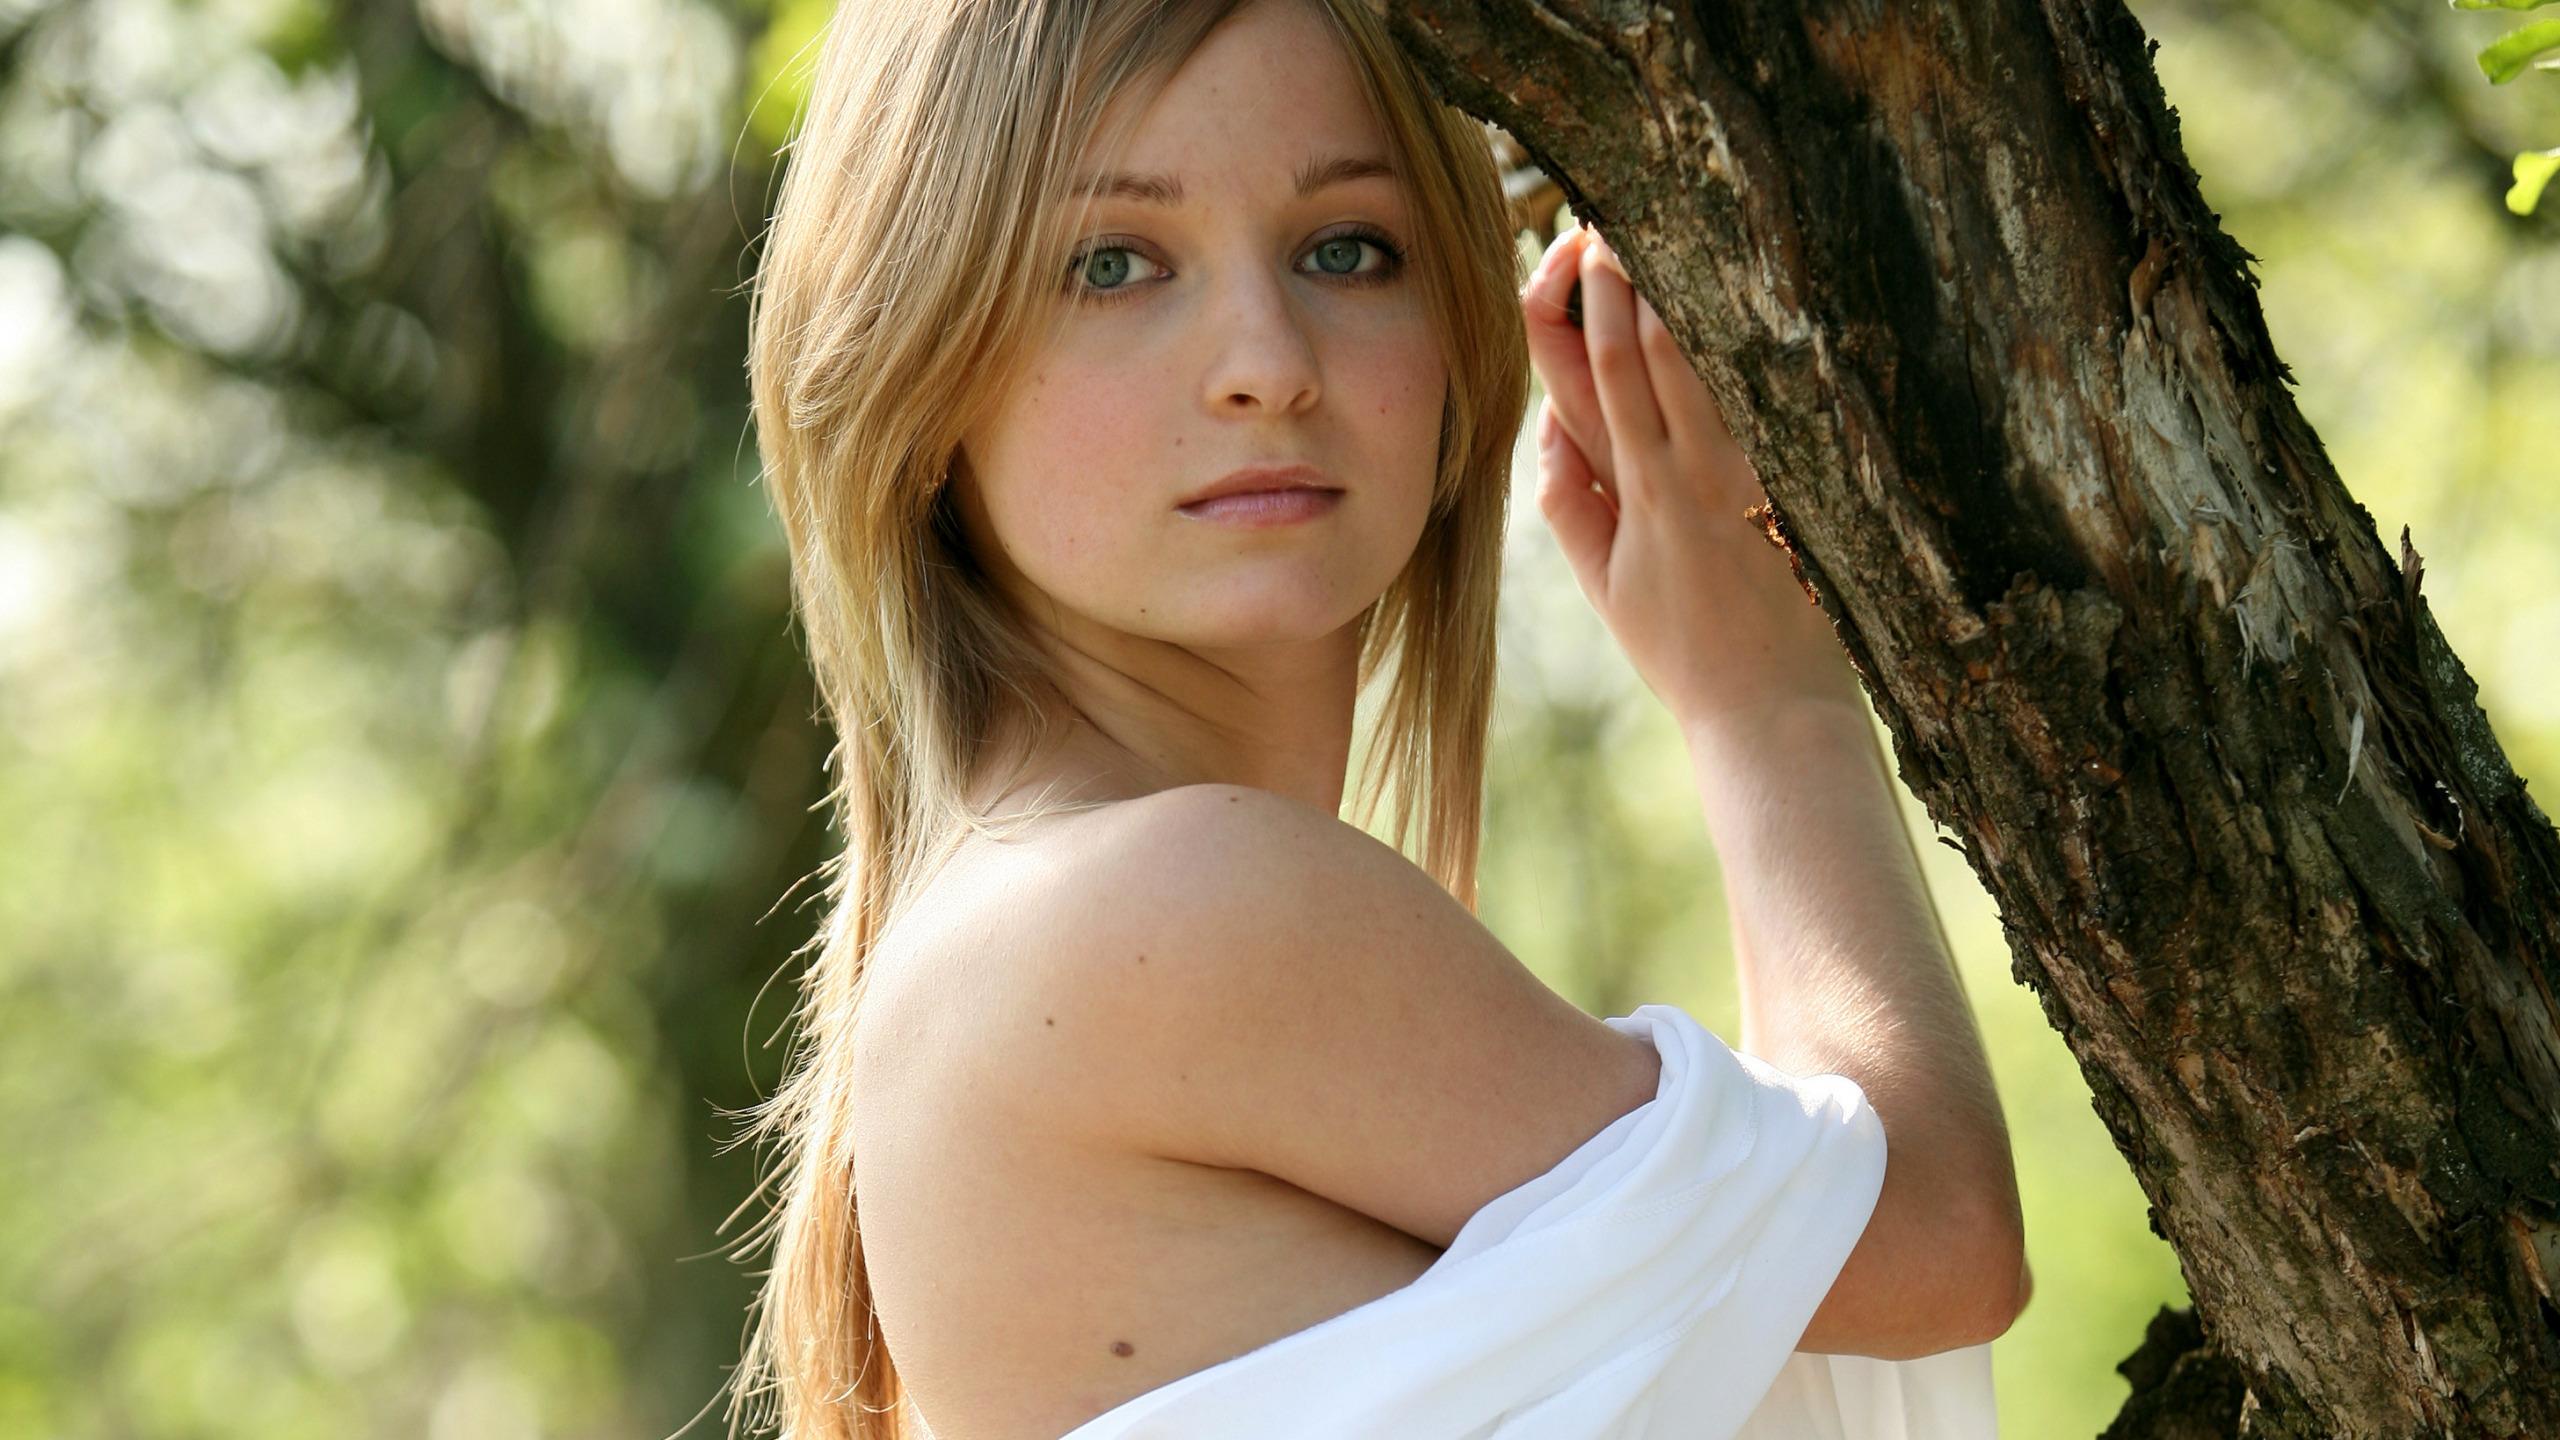 russian-photographers-young-girls